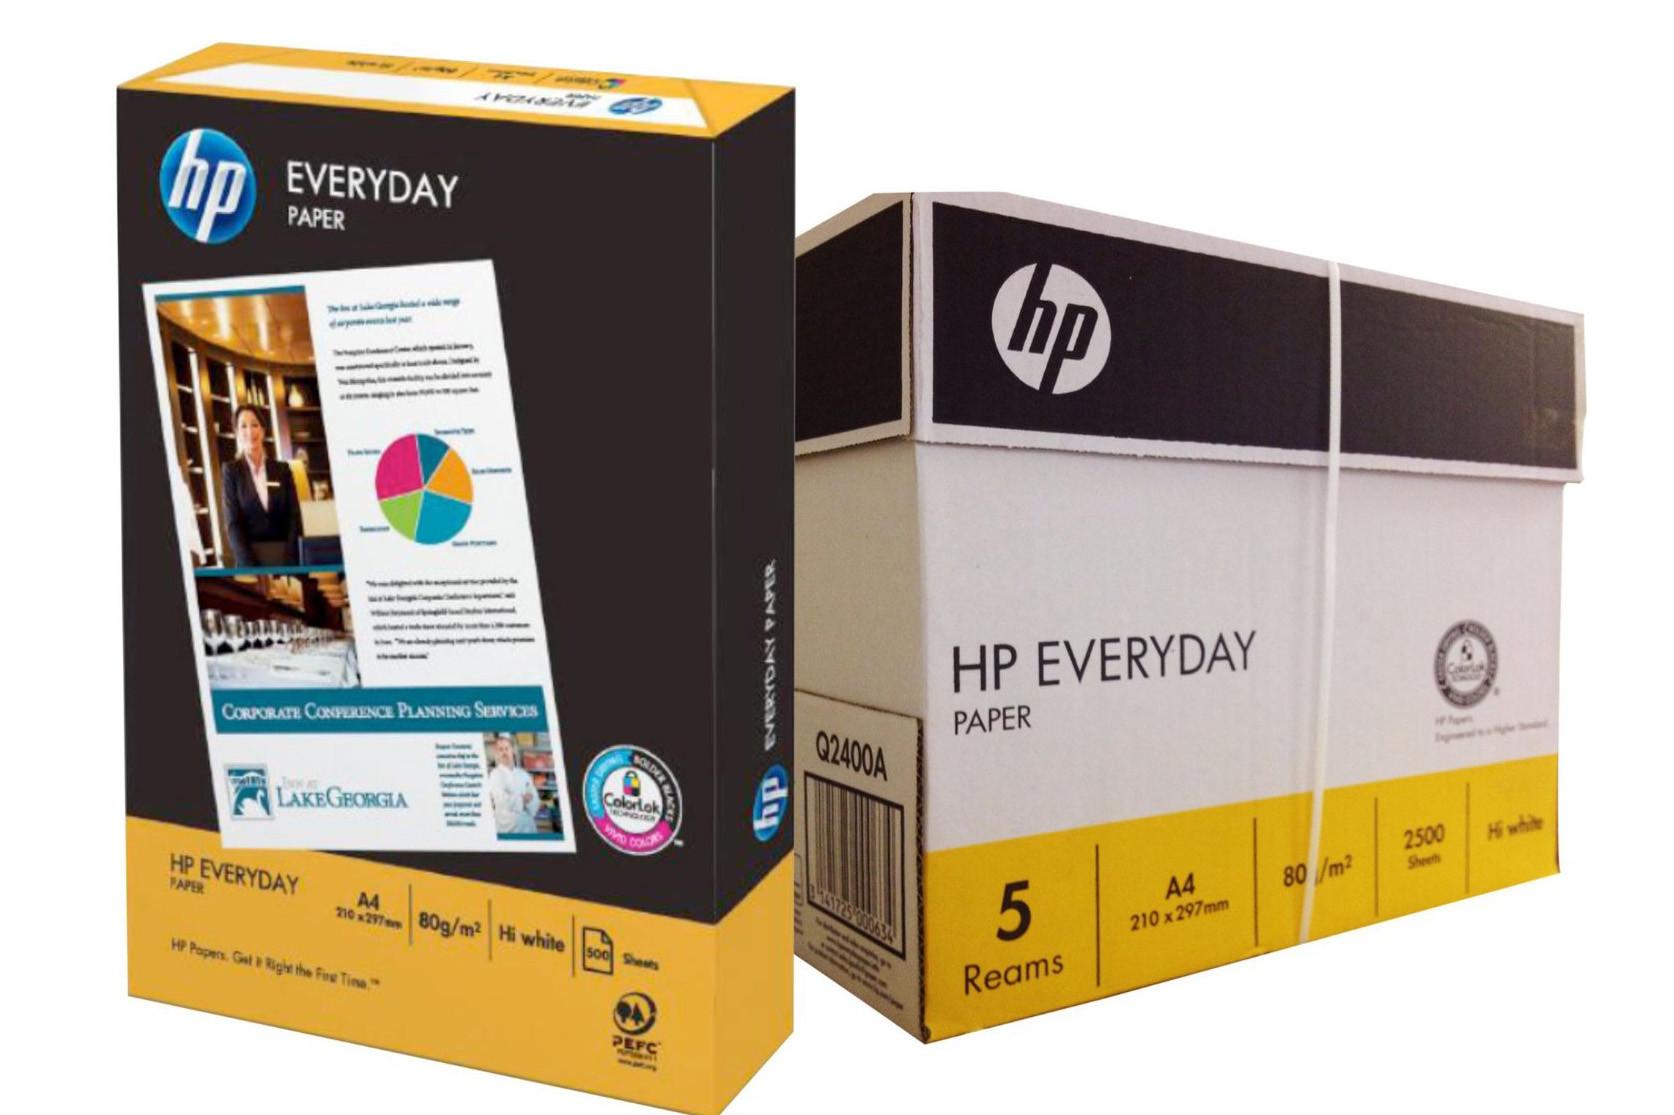 Hp Photocopy/Printing A4 Paper Carton